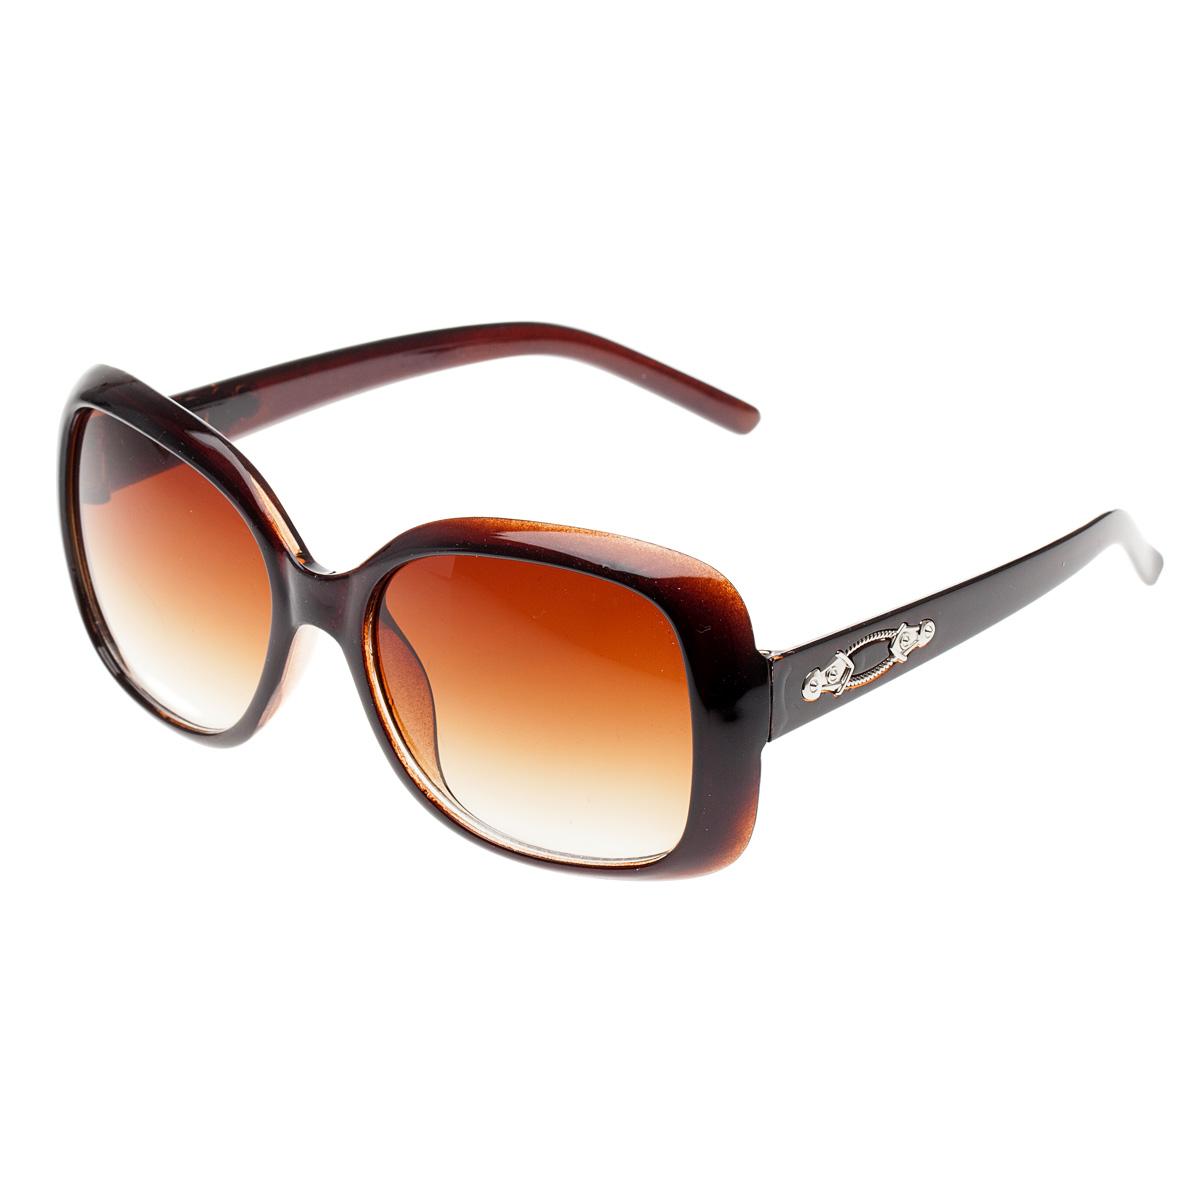 Фото - Очки солнцезащитные Sevenext, 23032-56 очки солнцезащитные sevenext 23032 28